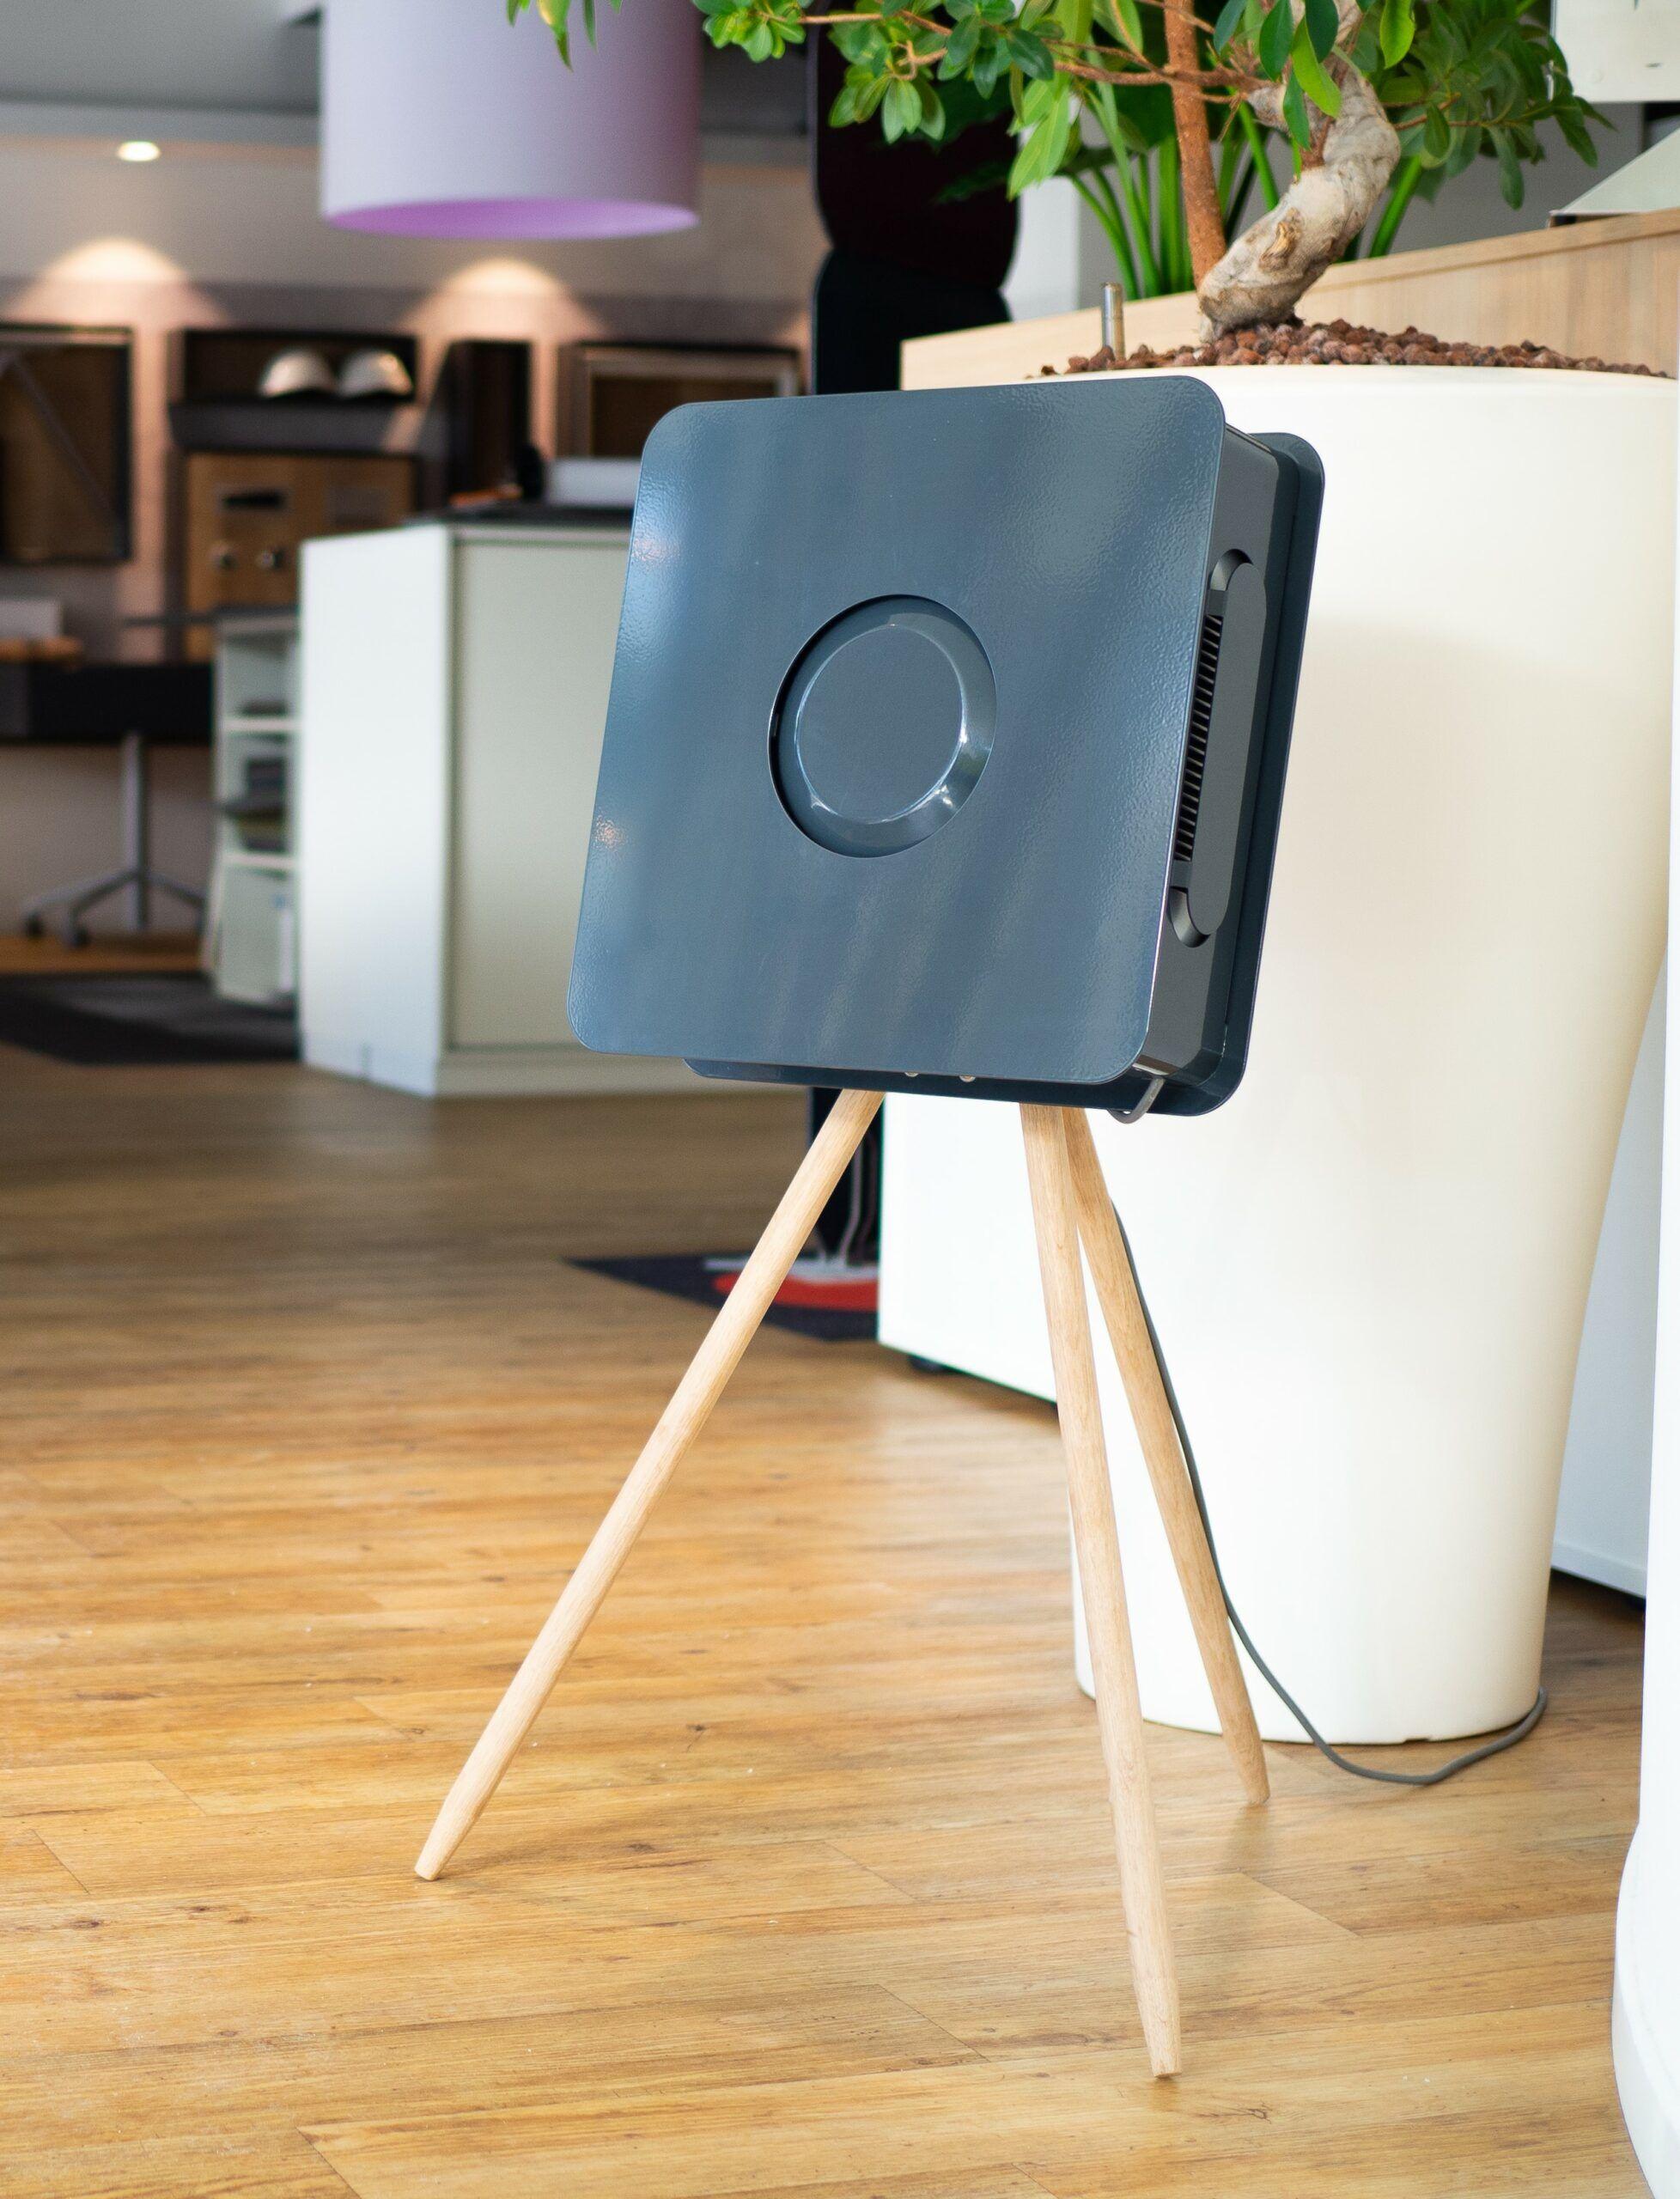 Variante 2 scaled - Fotobox Bremen mieten